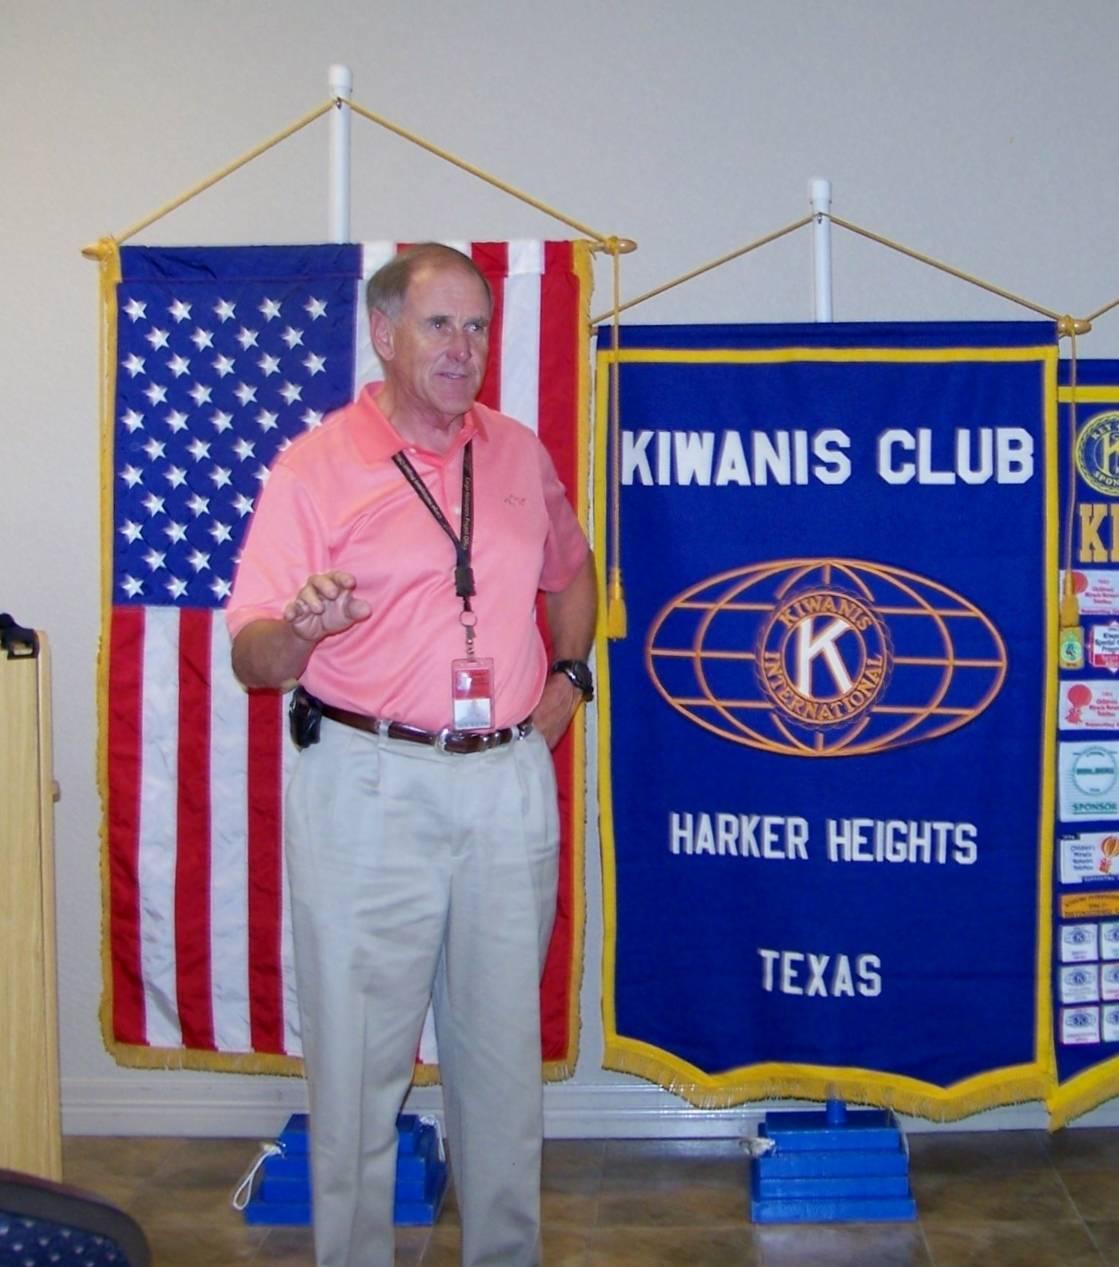 Garry McNiesh JROTC Program Sr Instructor